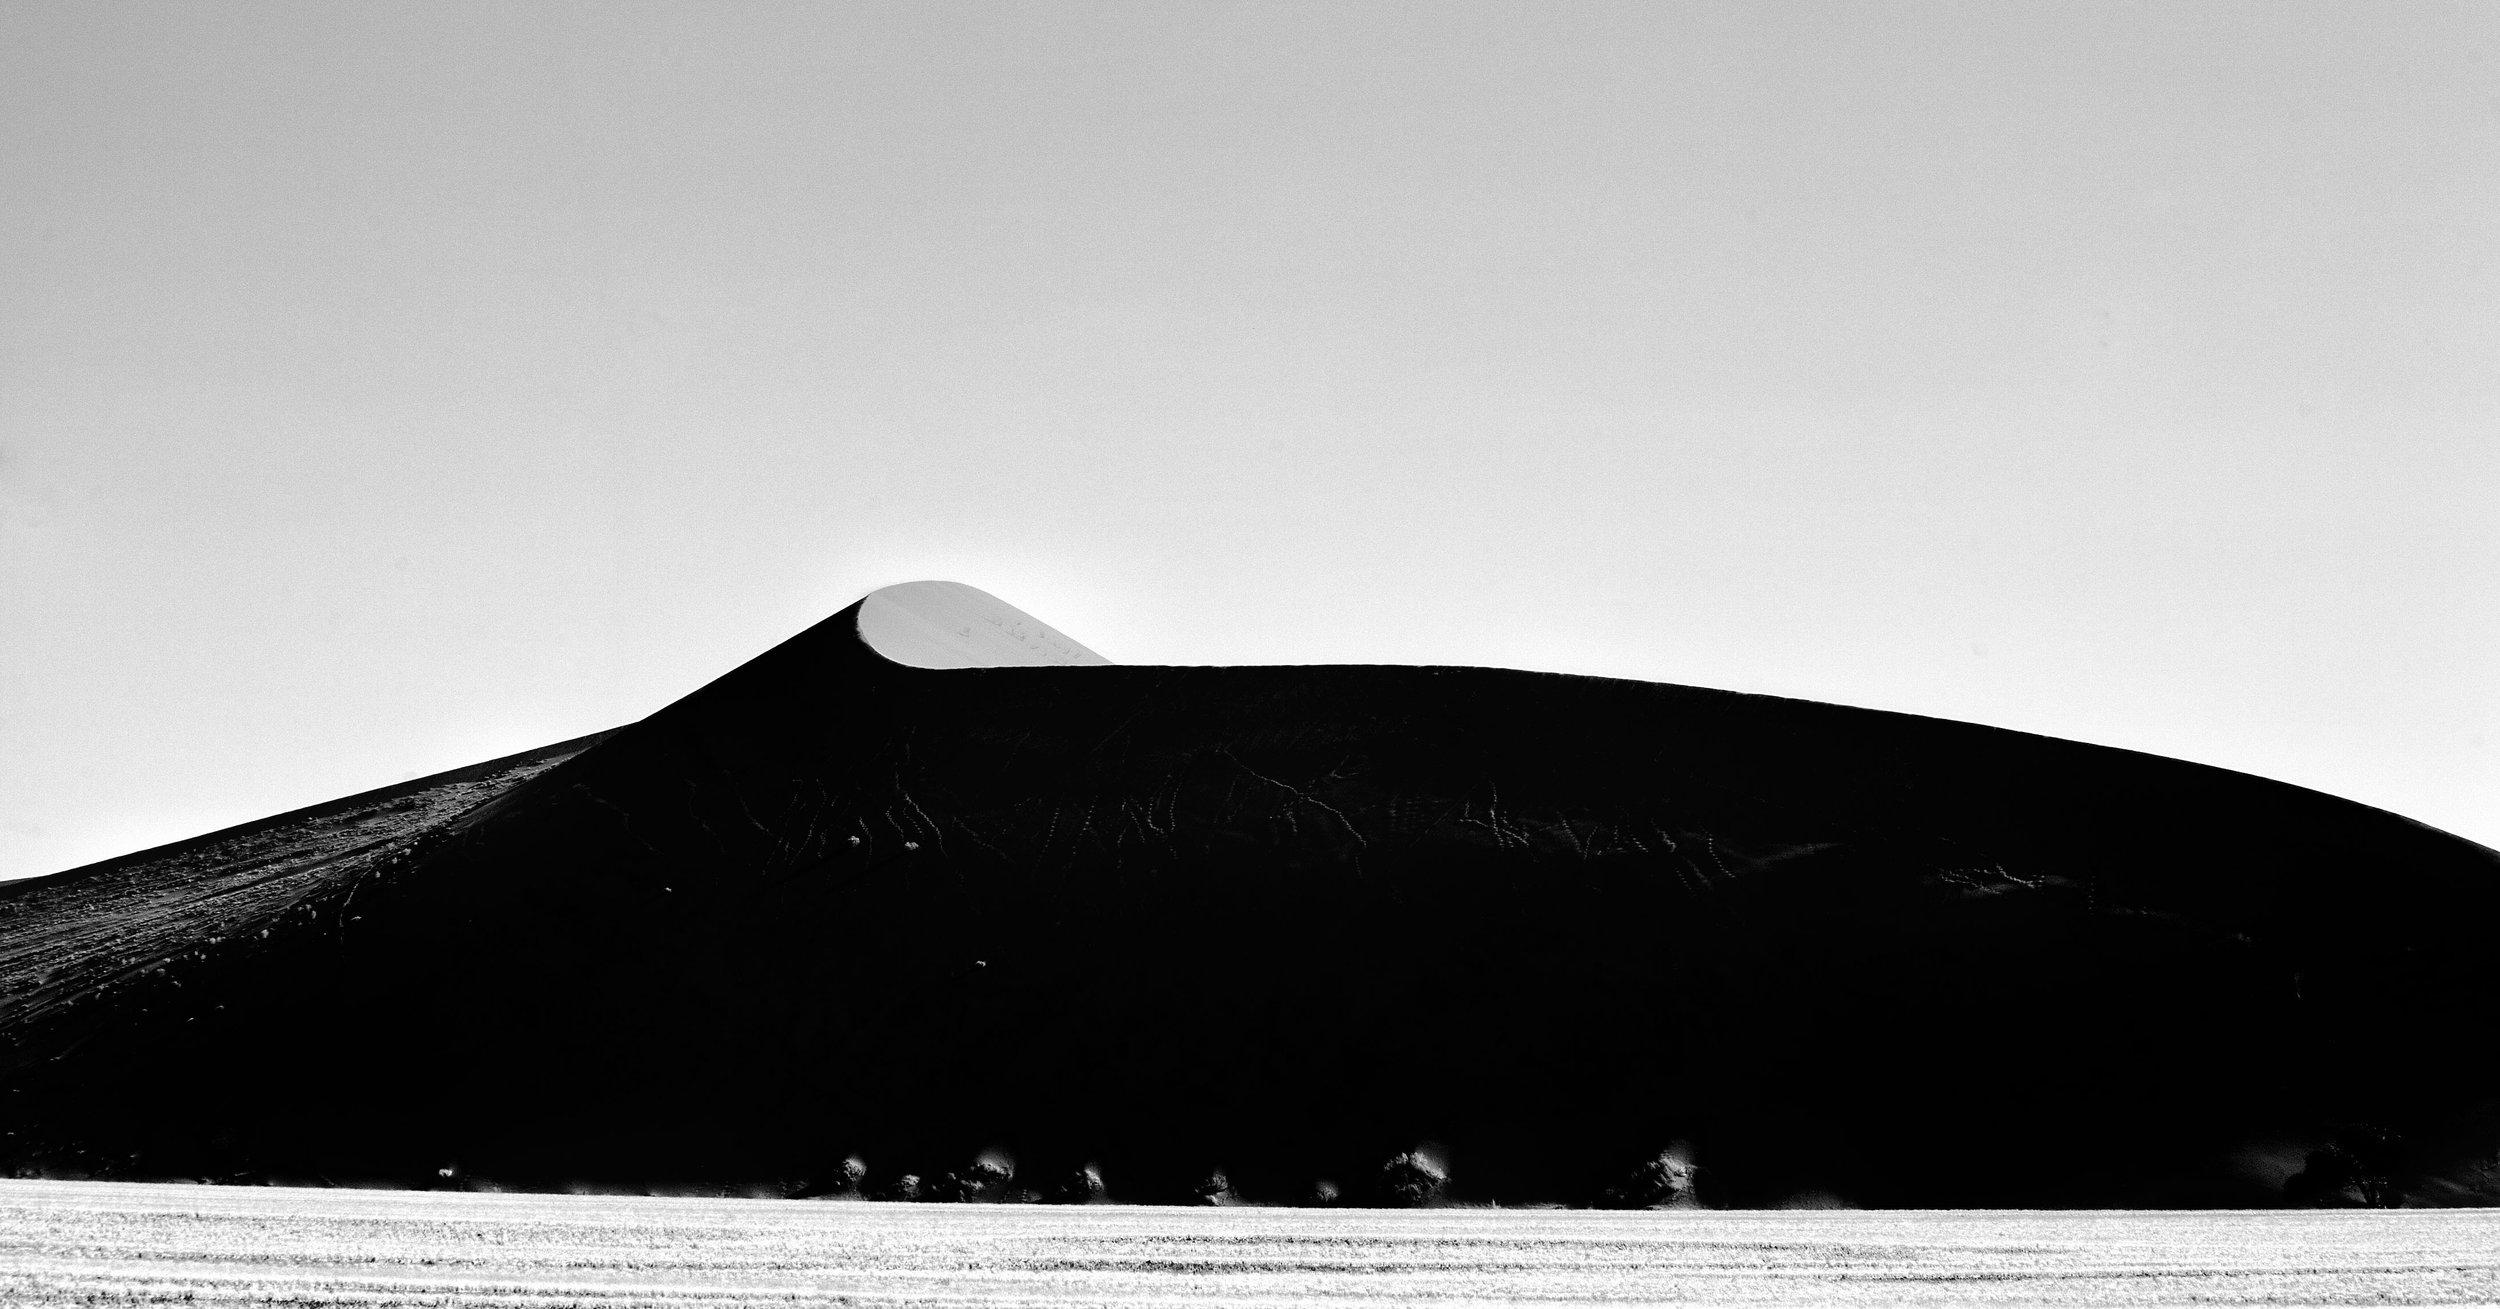 _MG_5676-funa-namibia-pano-ig.jpg